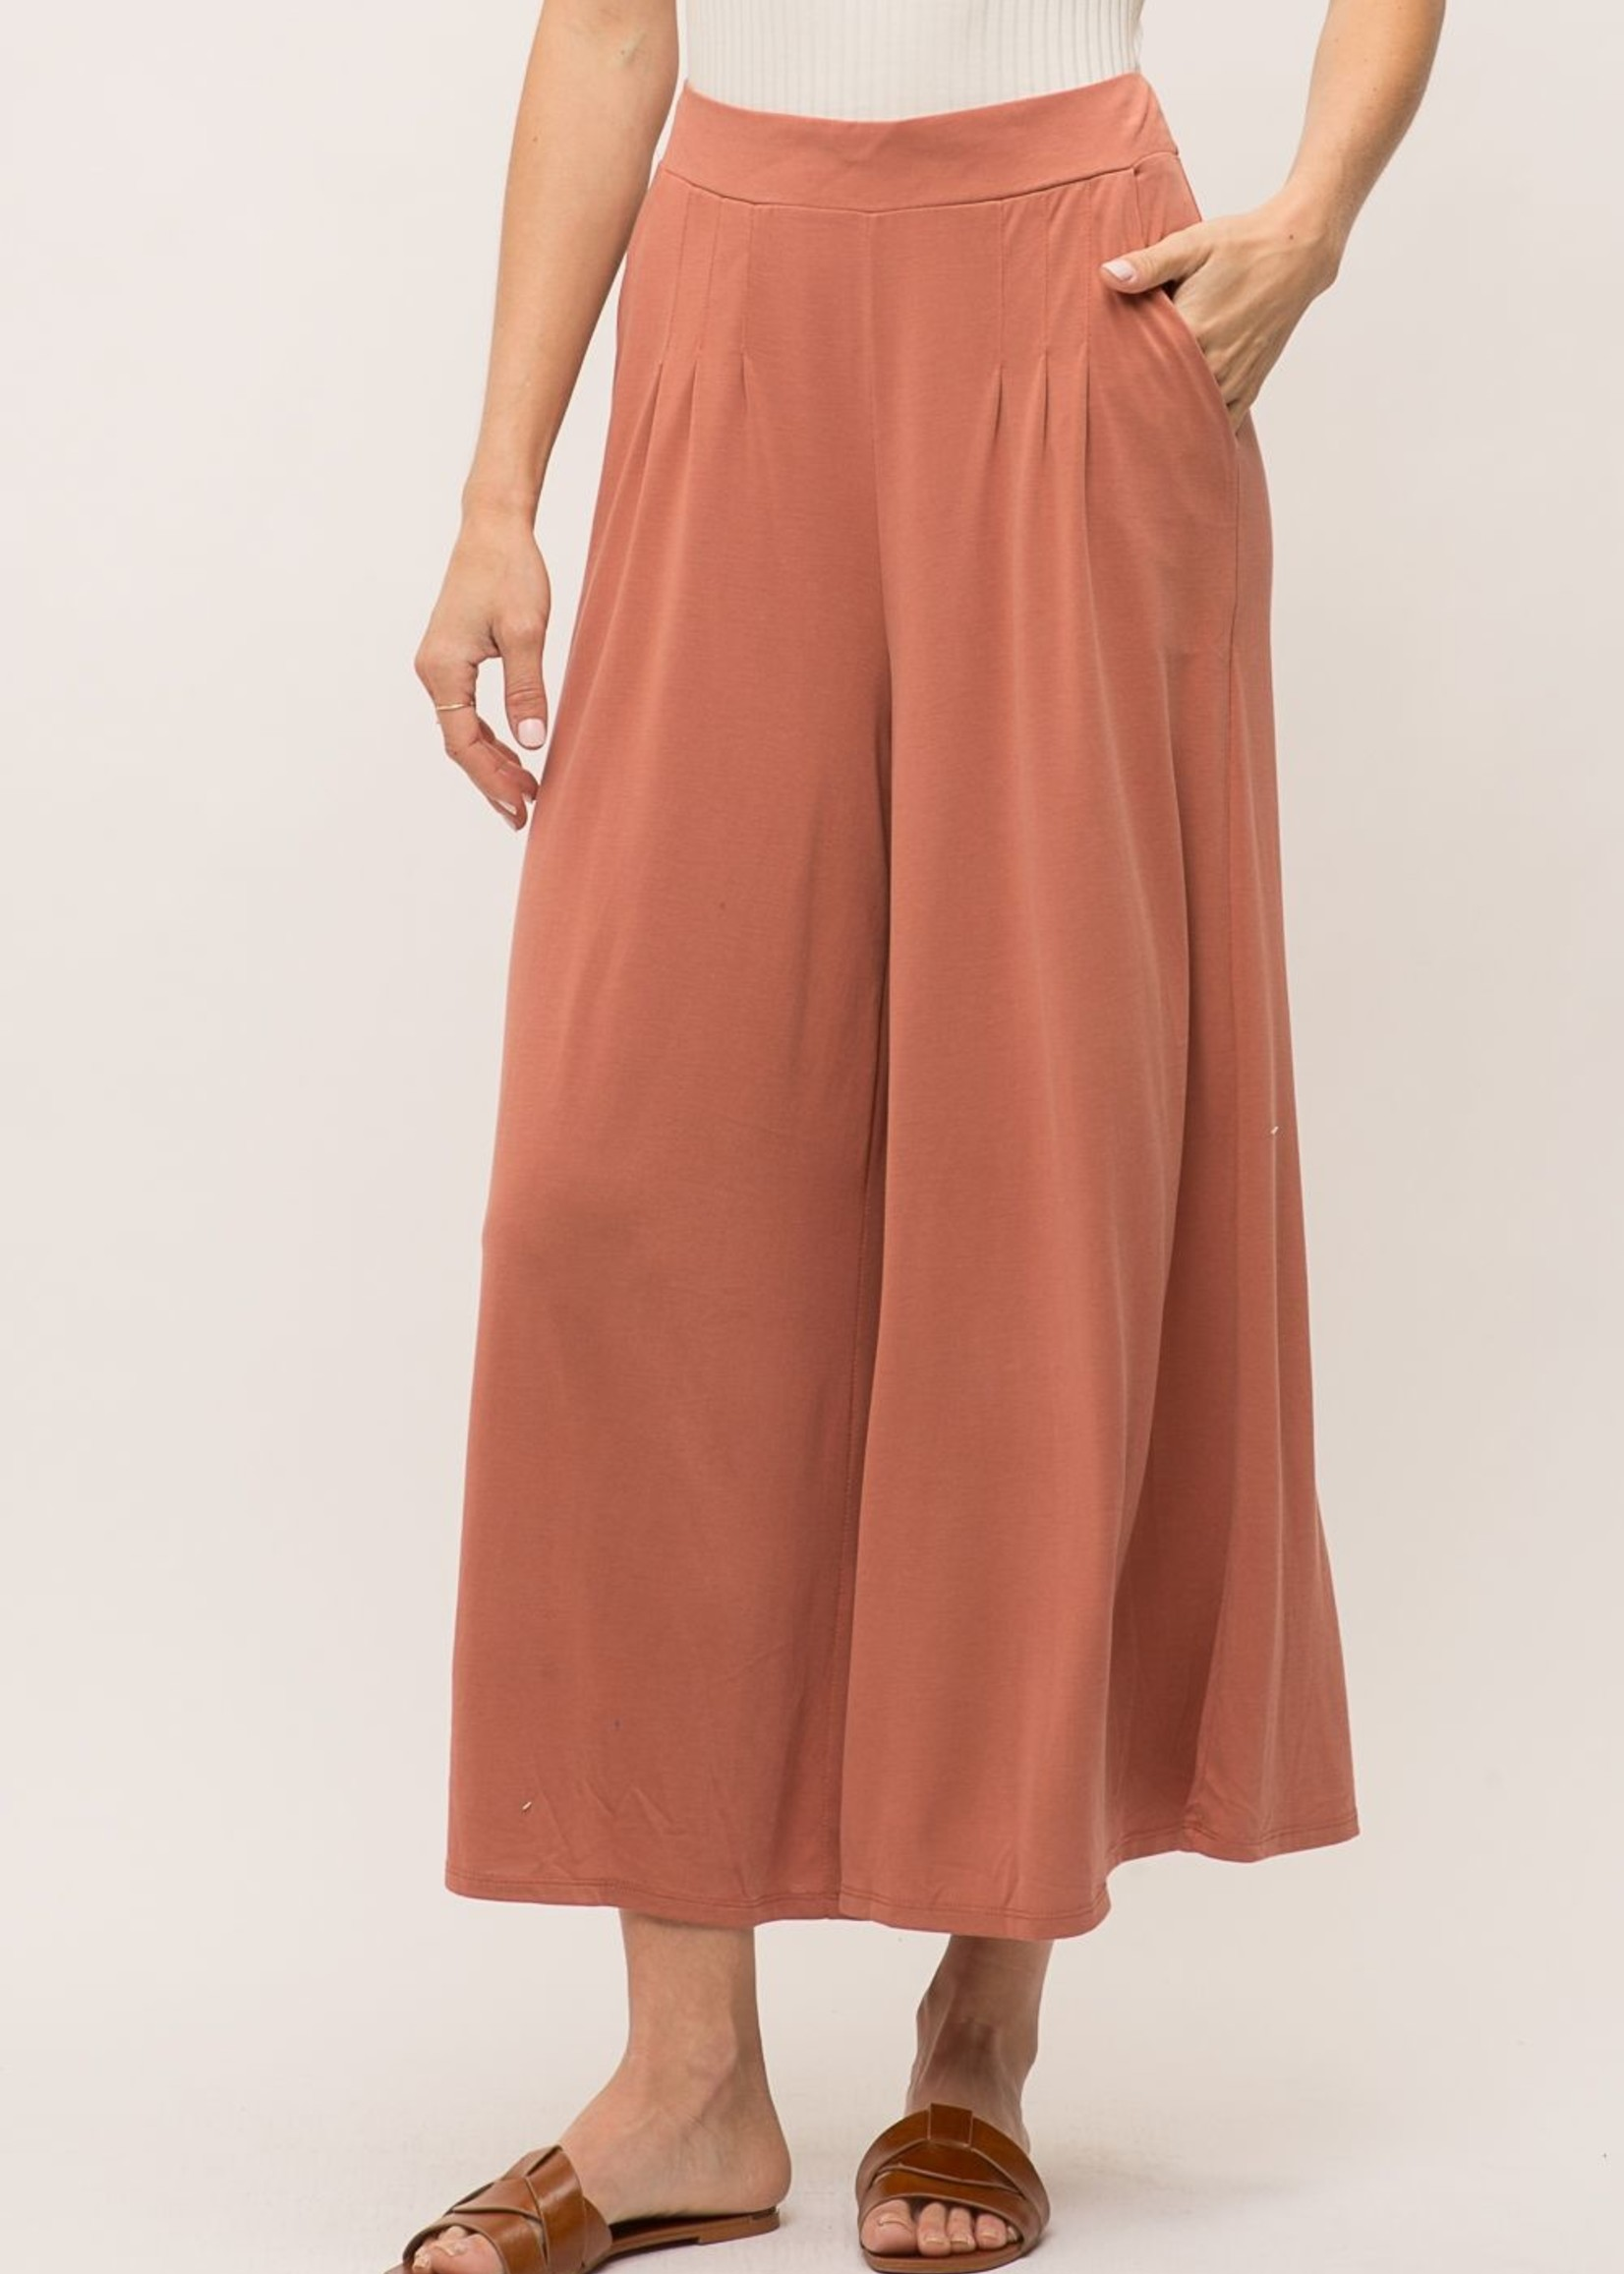 Mystree Mystree Apricot Wide-Leg Pants